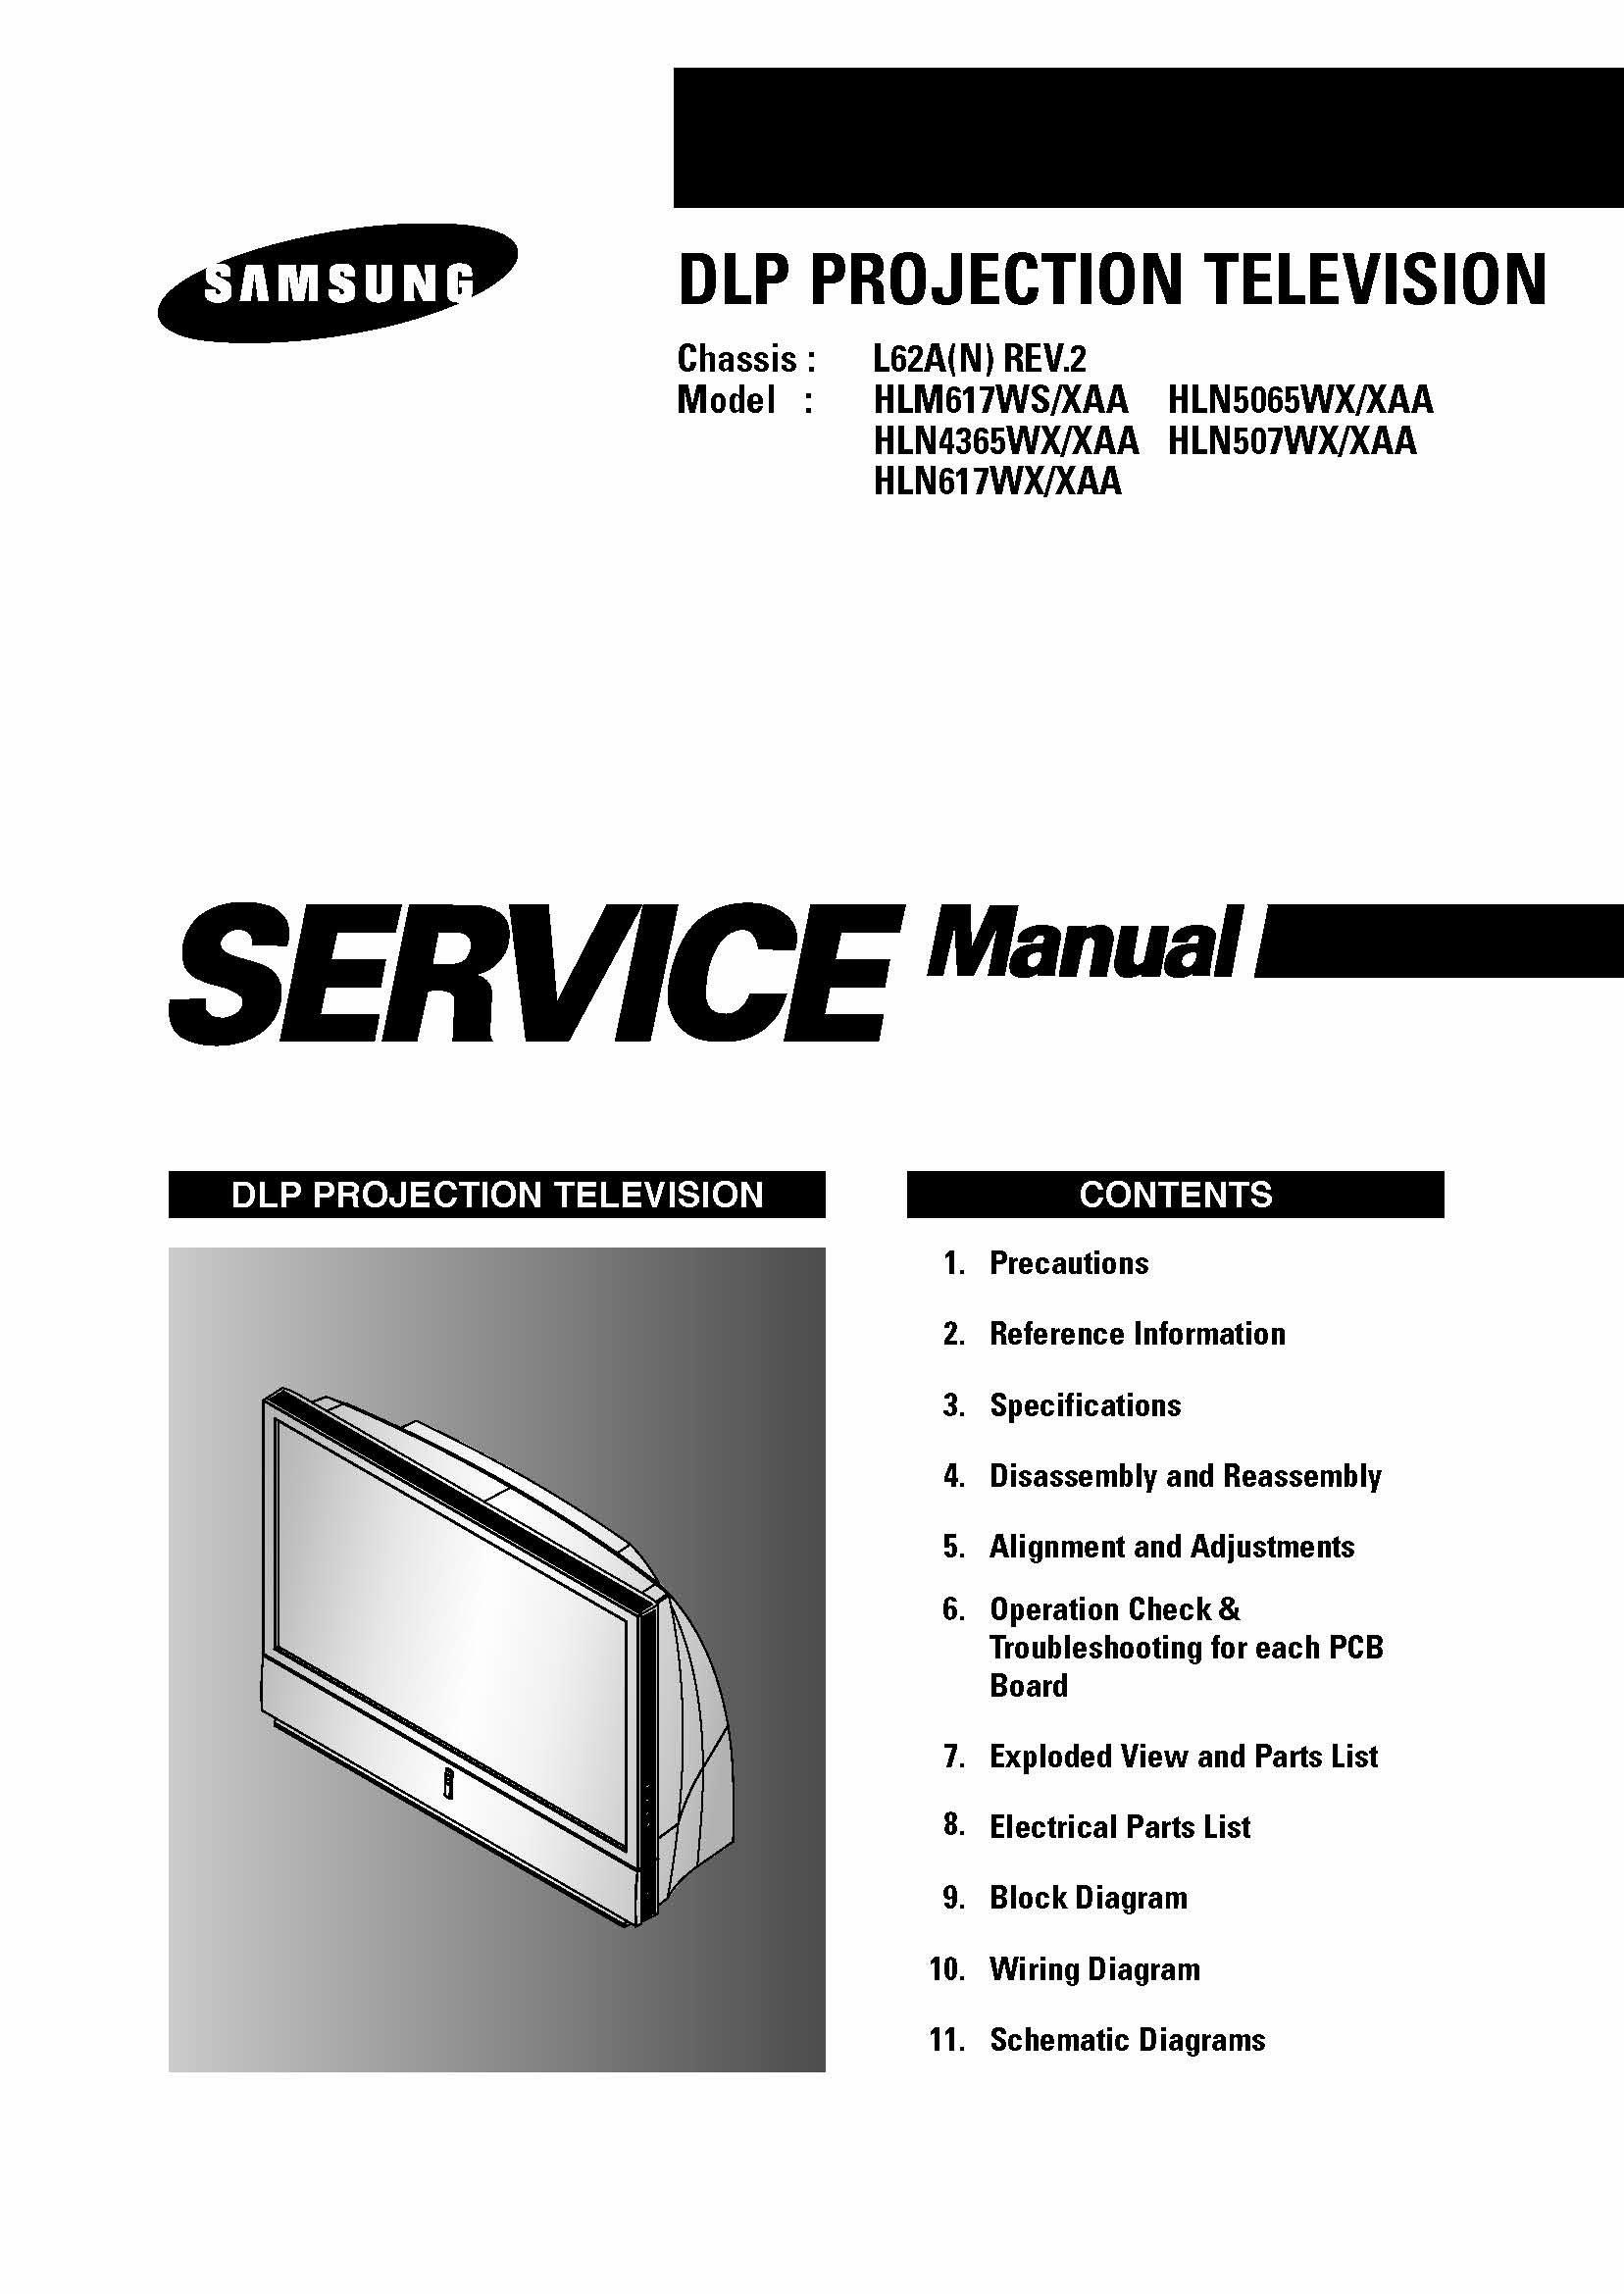 samsung hlm617ws xaa hln617wx xaa dlp tv service manual